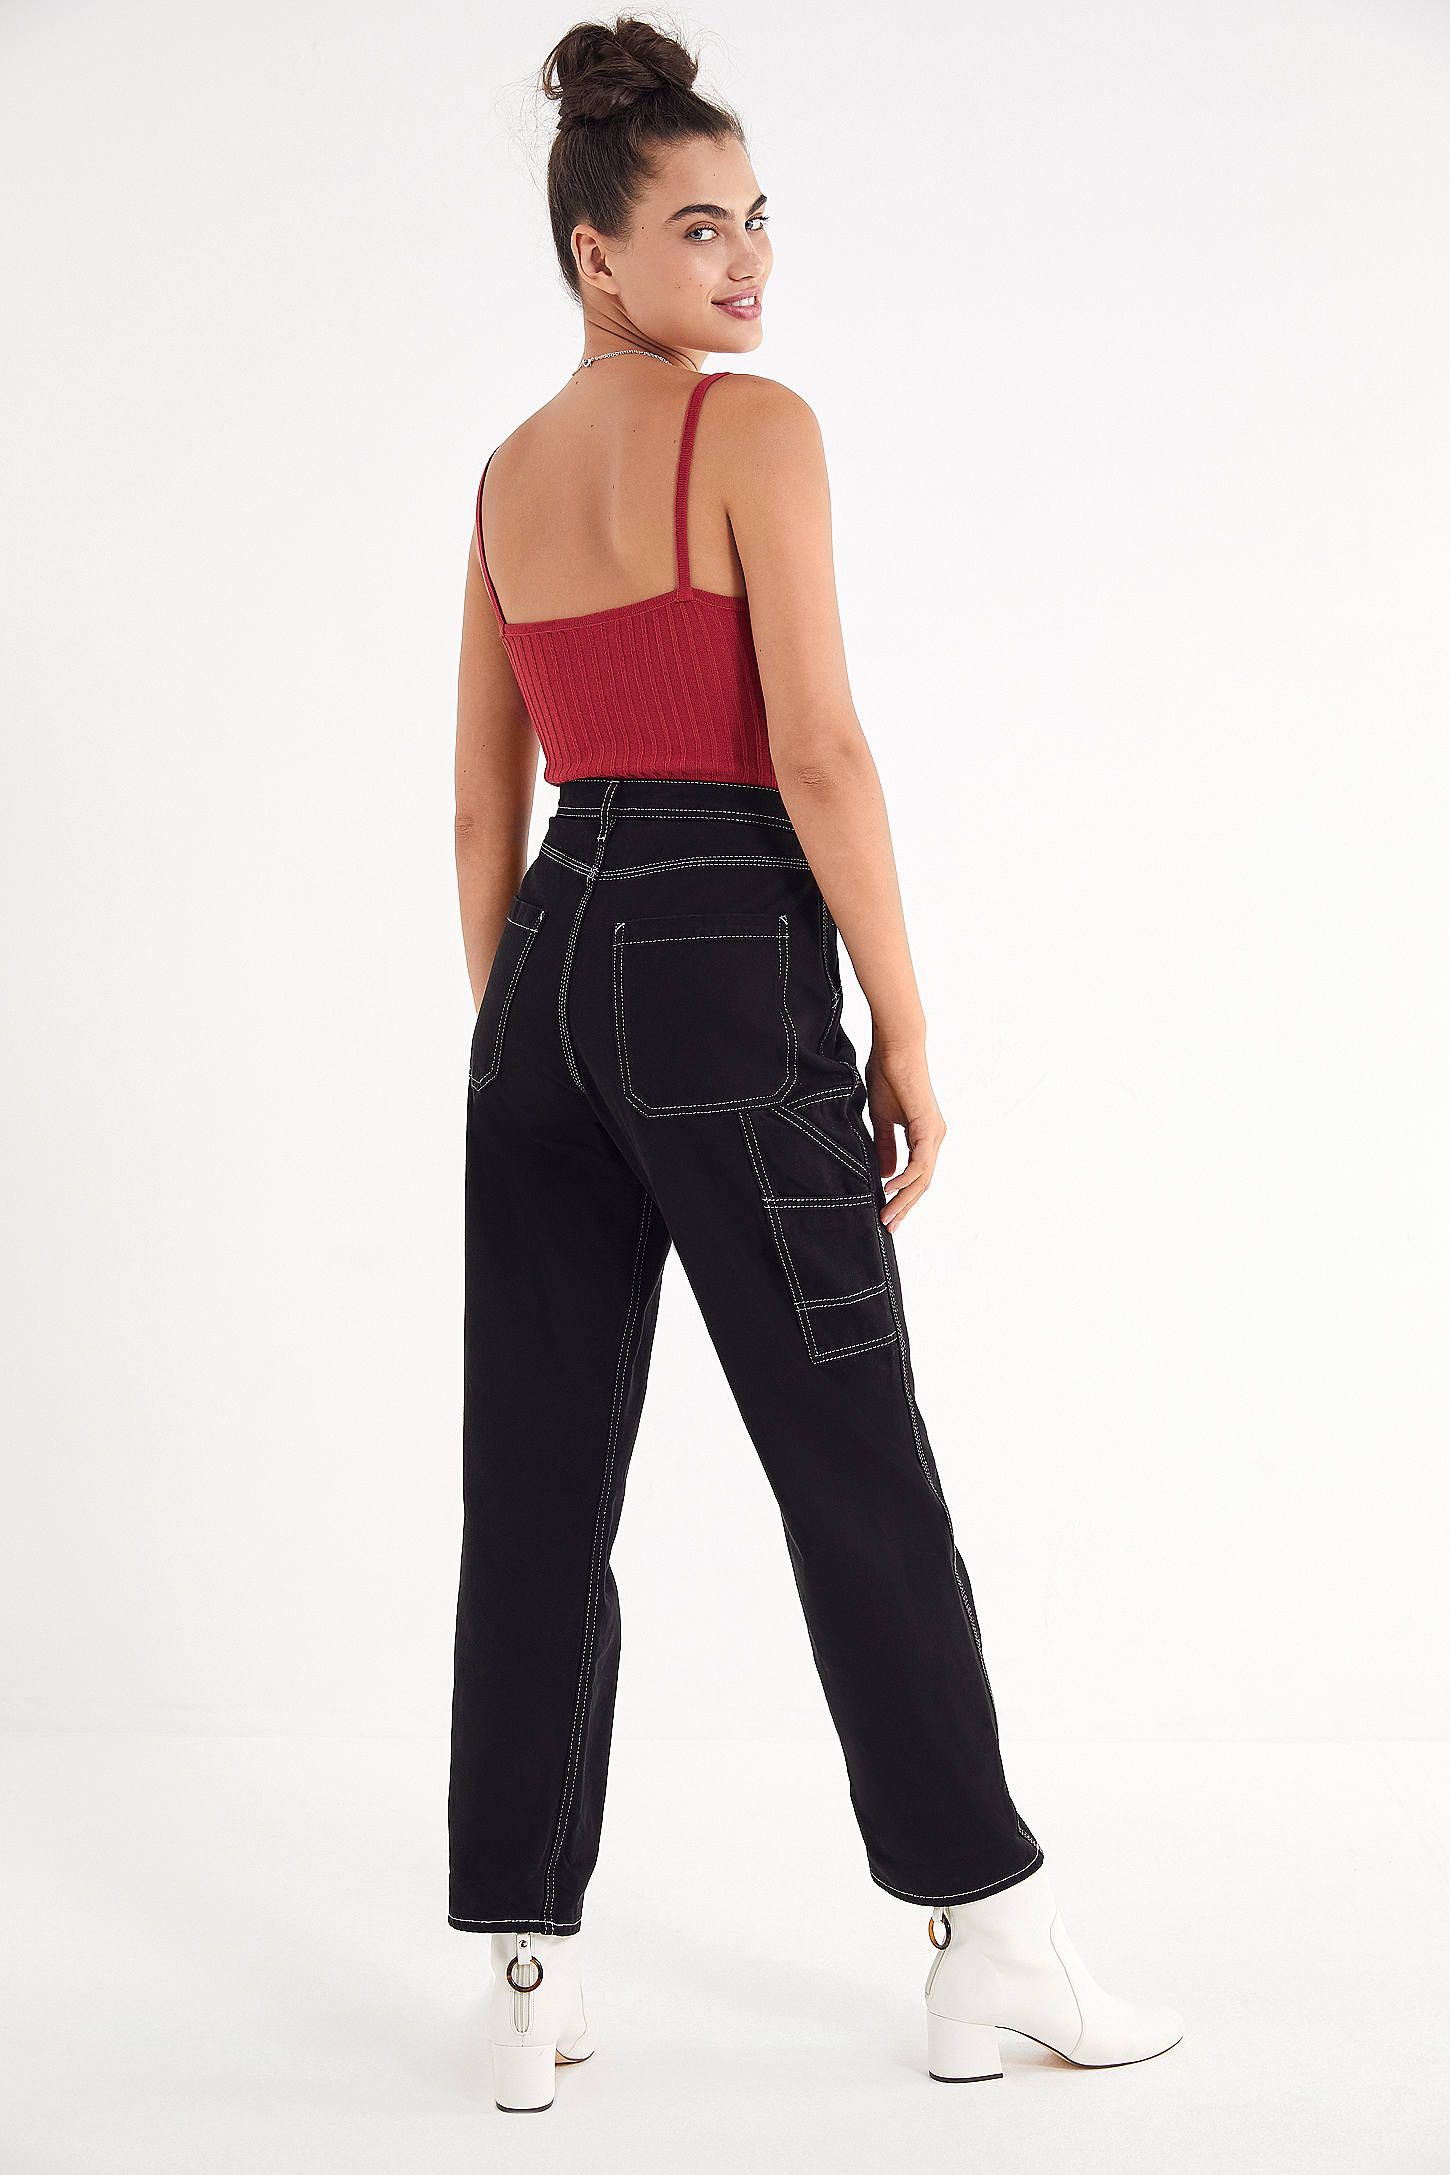 c59704f2fbe6 BDG High-Rise Workwear Jean